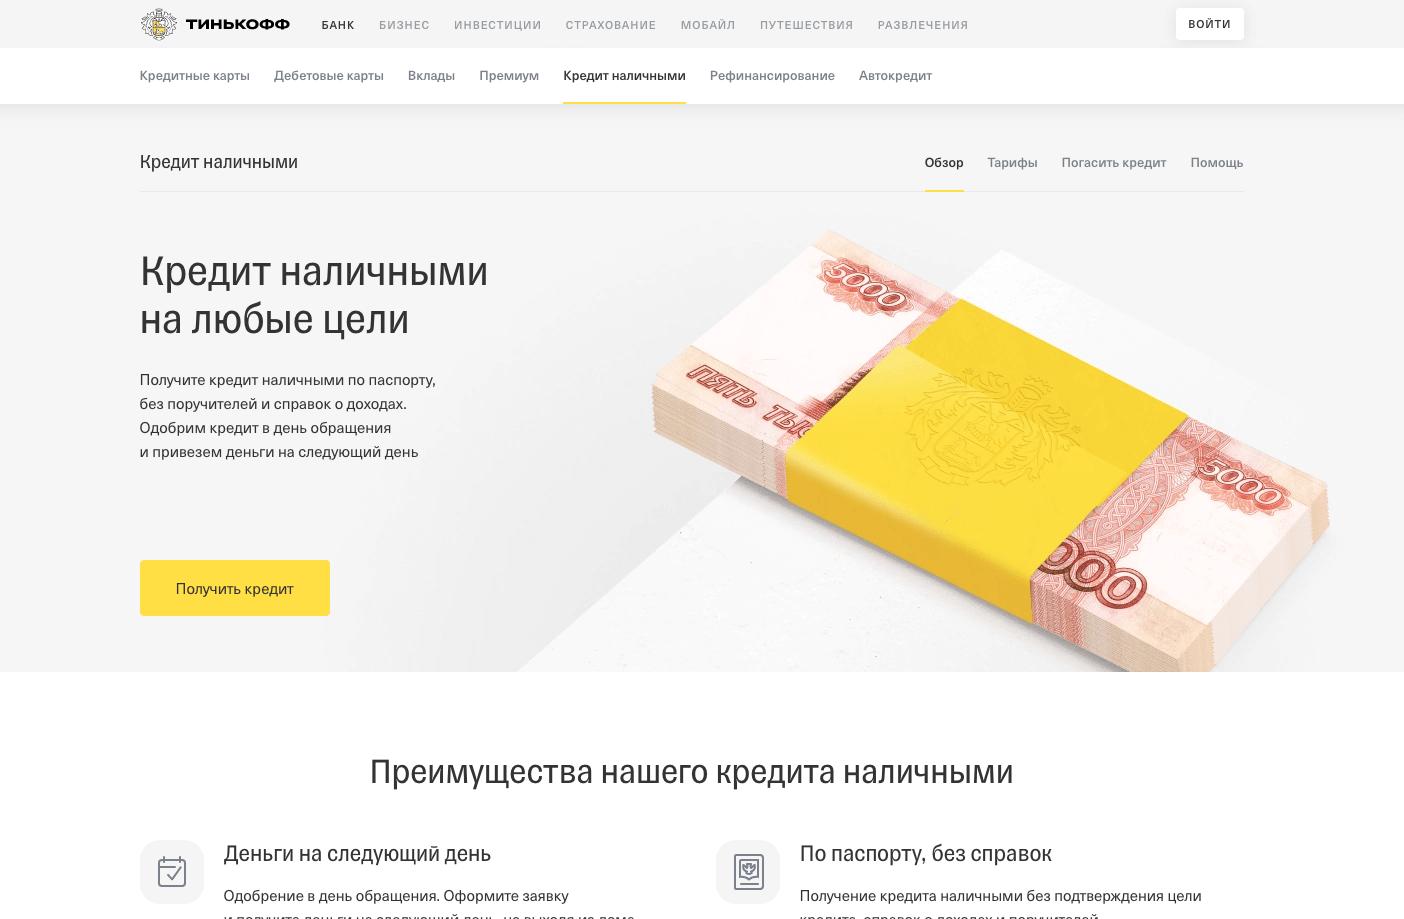 Скриншот сайта Тинькофф